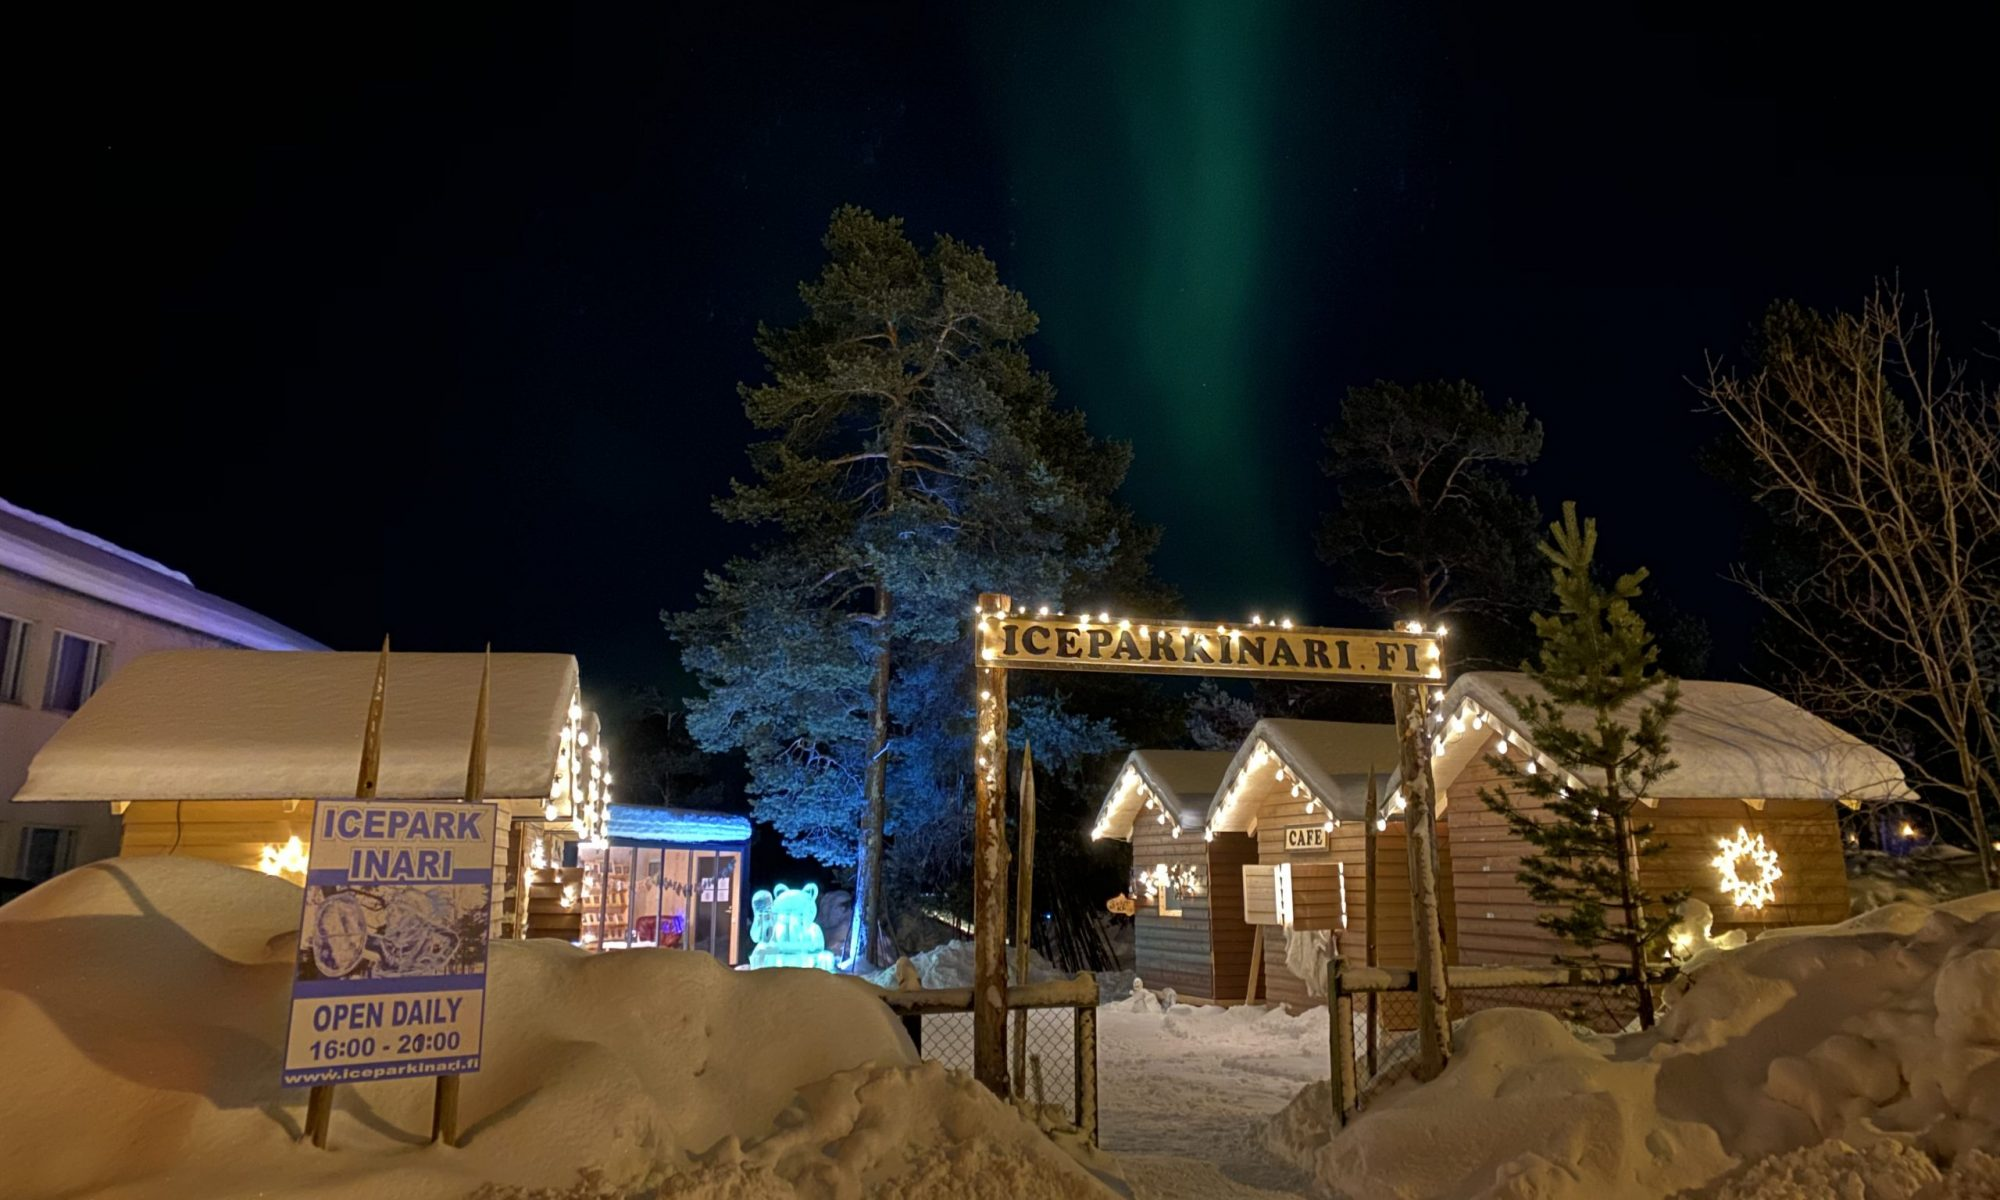 Inari Icepark